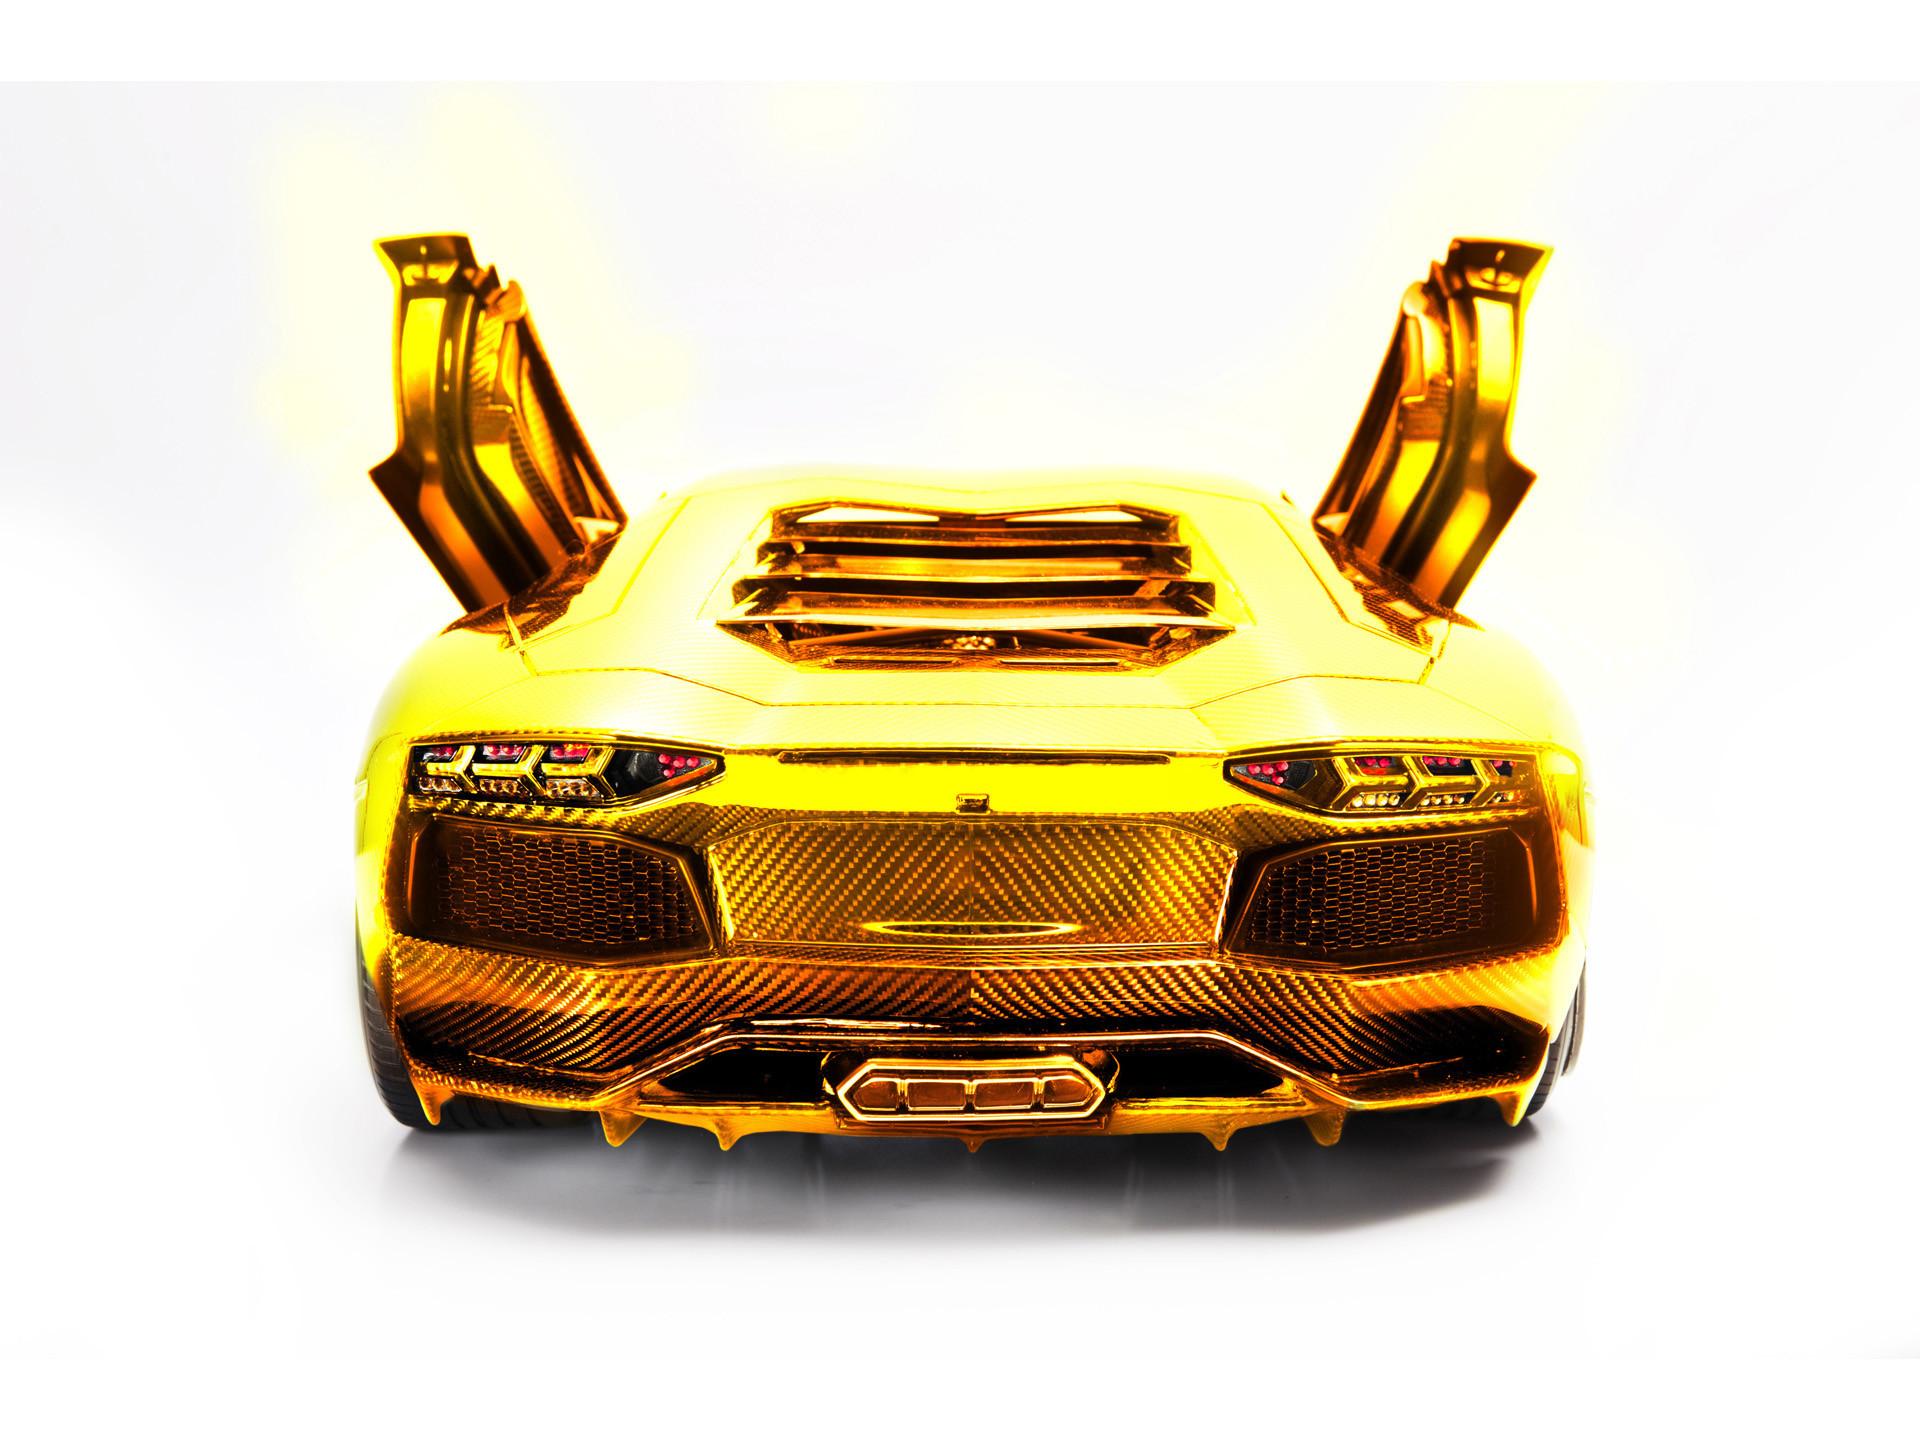 Gold Lamborghini Wallpaper (78+ images)